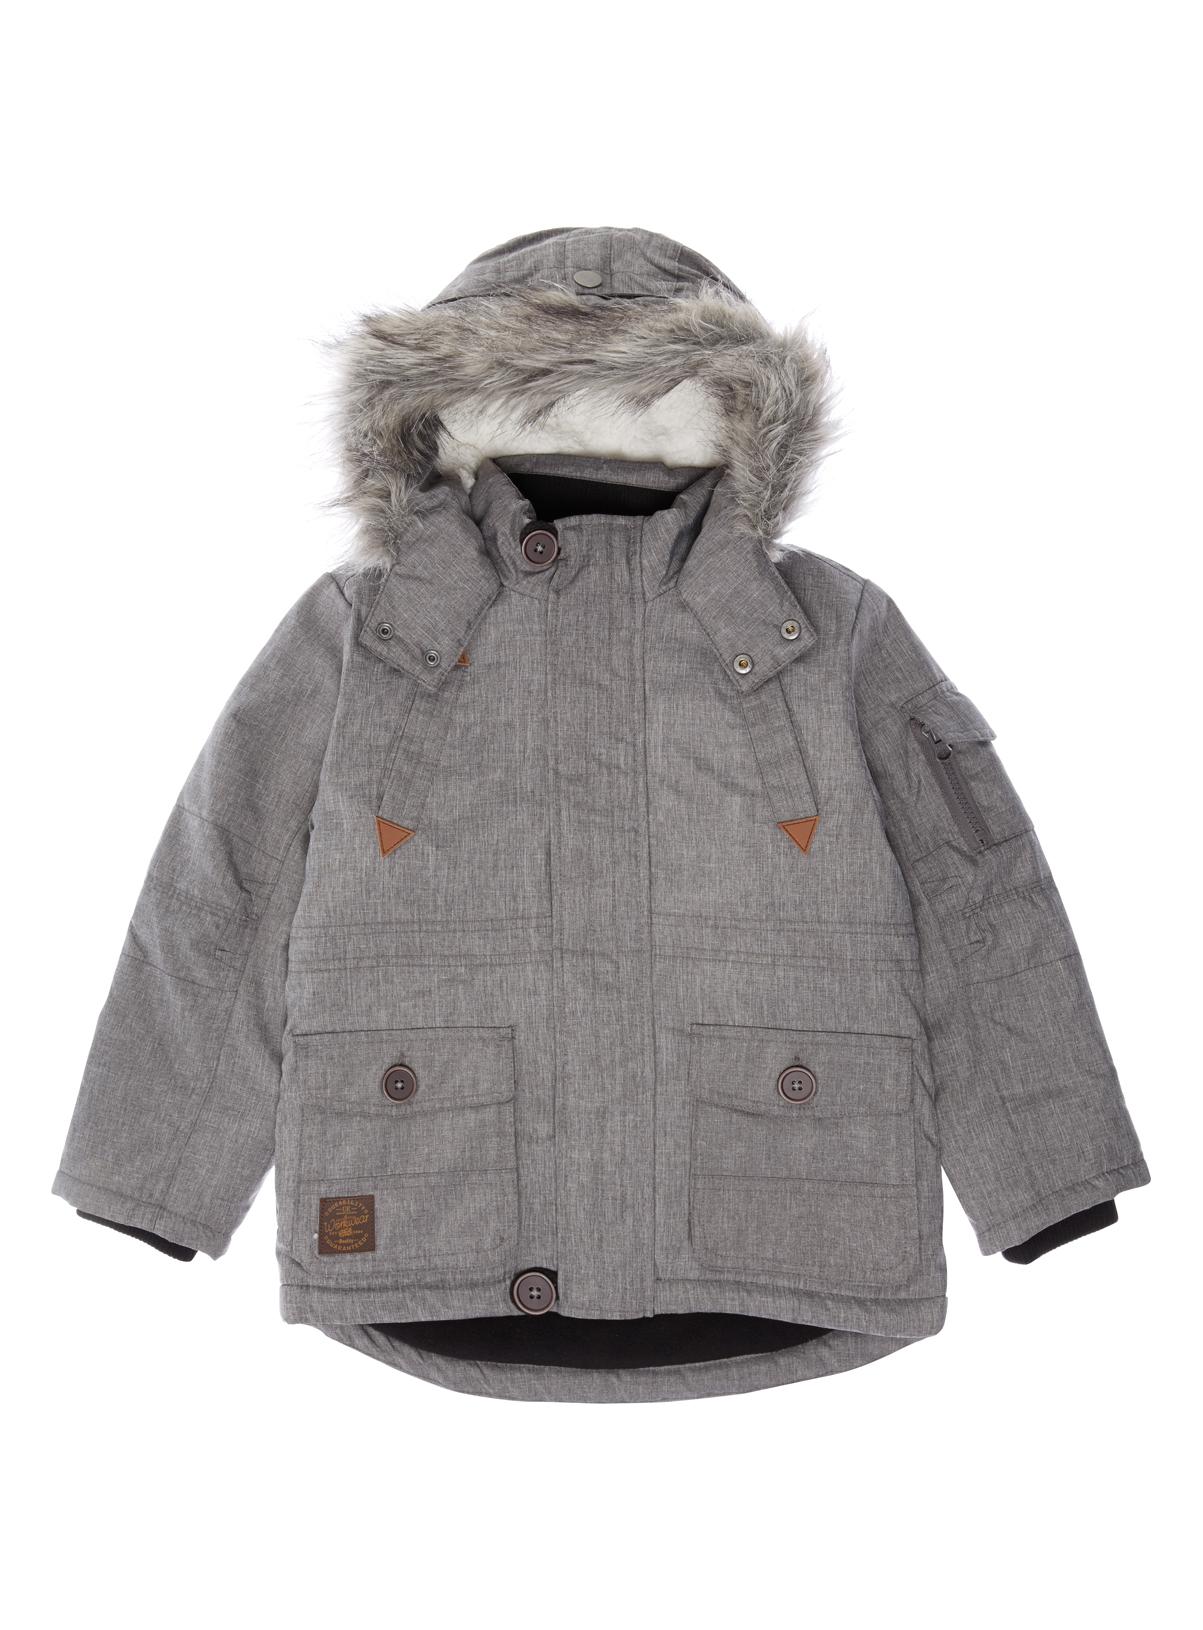 All Boy's Clothing Boys Grey Parka Jacket (3-12 years) | Tu clothing